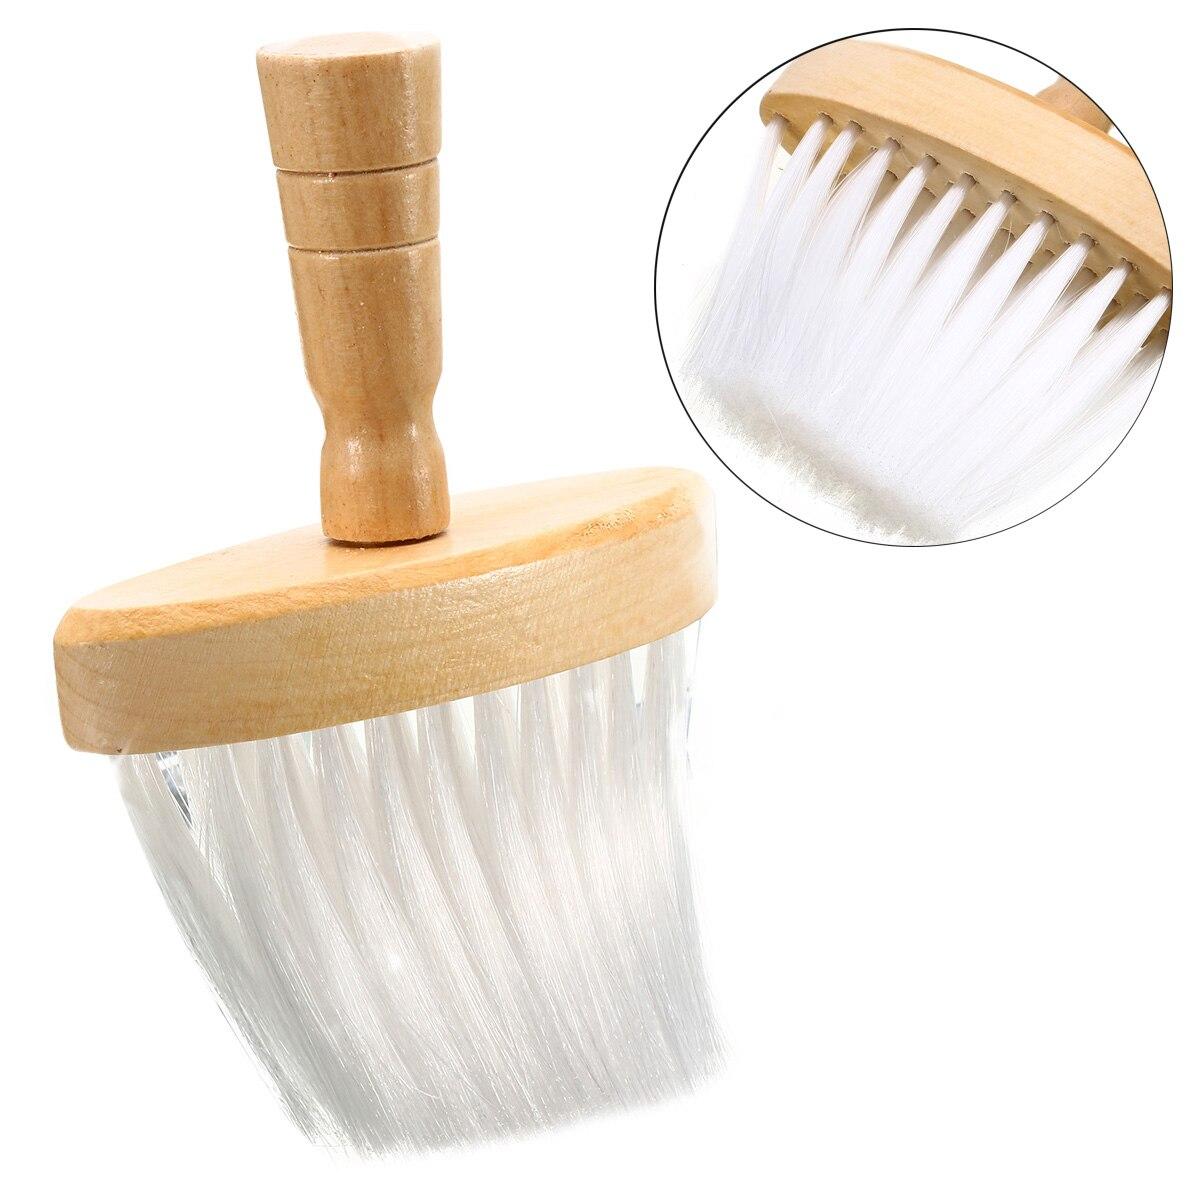 Mayitr 1pc Soft Neck Duster Brushes Wooden Handle Barber Wide Neck Duster Brush Barber Hair Clean Hairbrush  Styling Tools